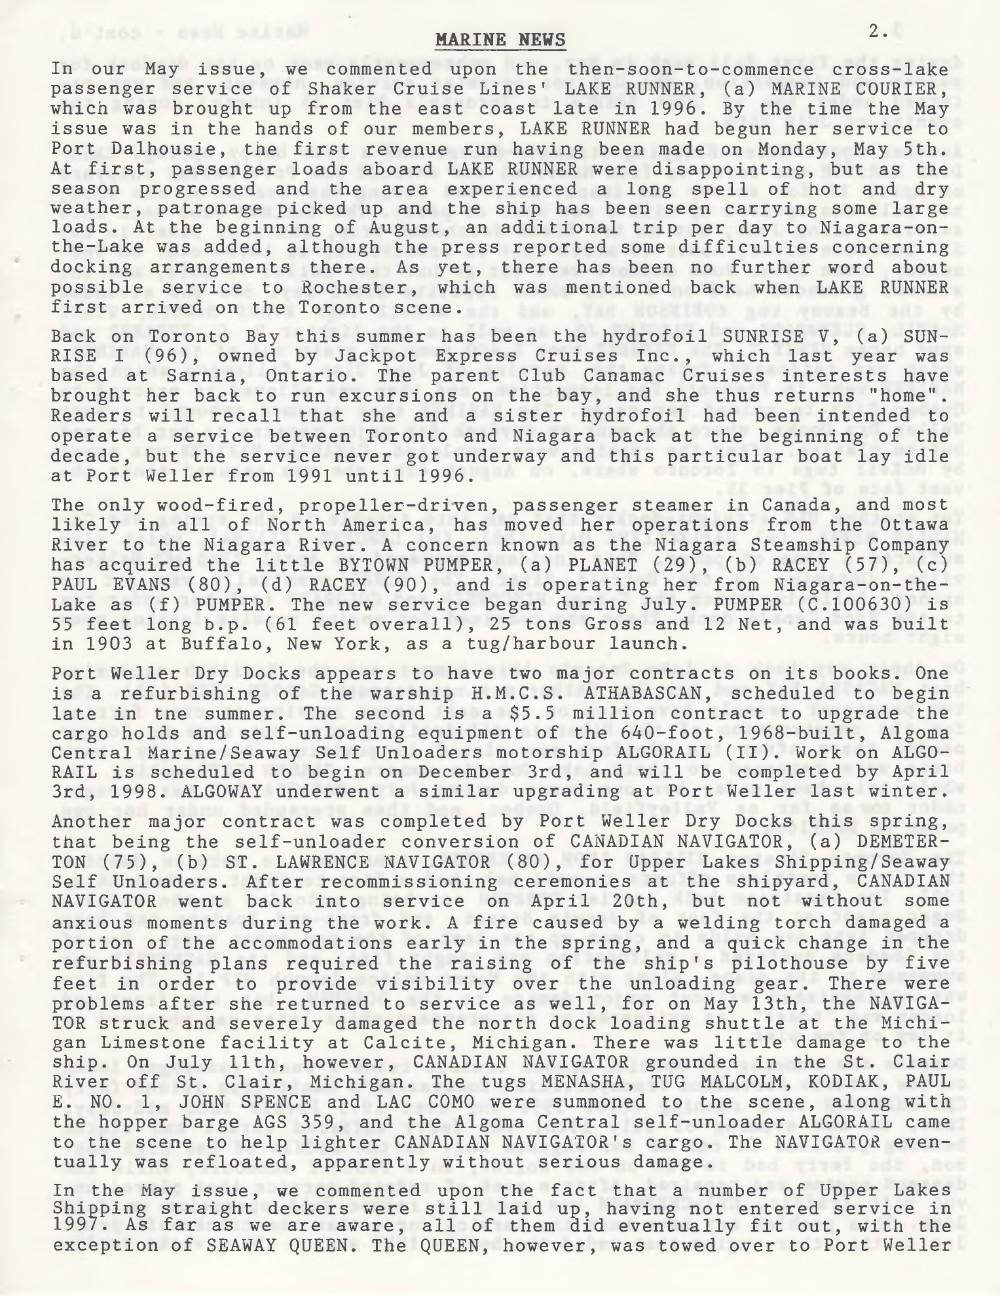 Scanner, v. 29, no. 9 (Mid-Summer 1997)